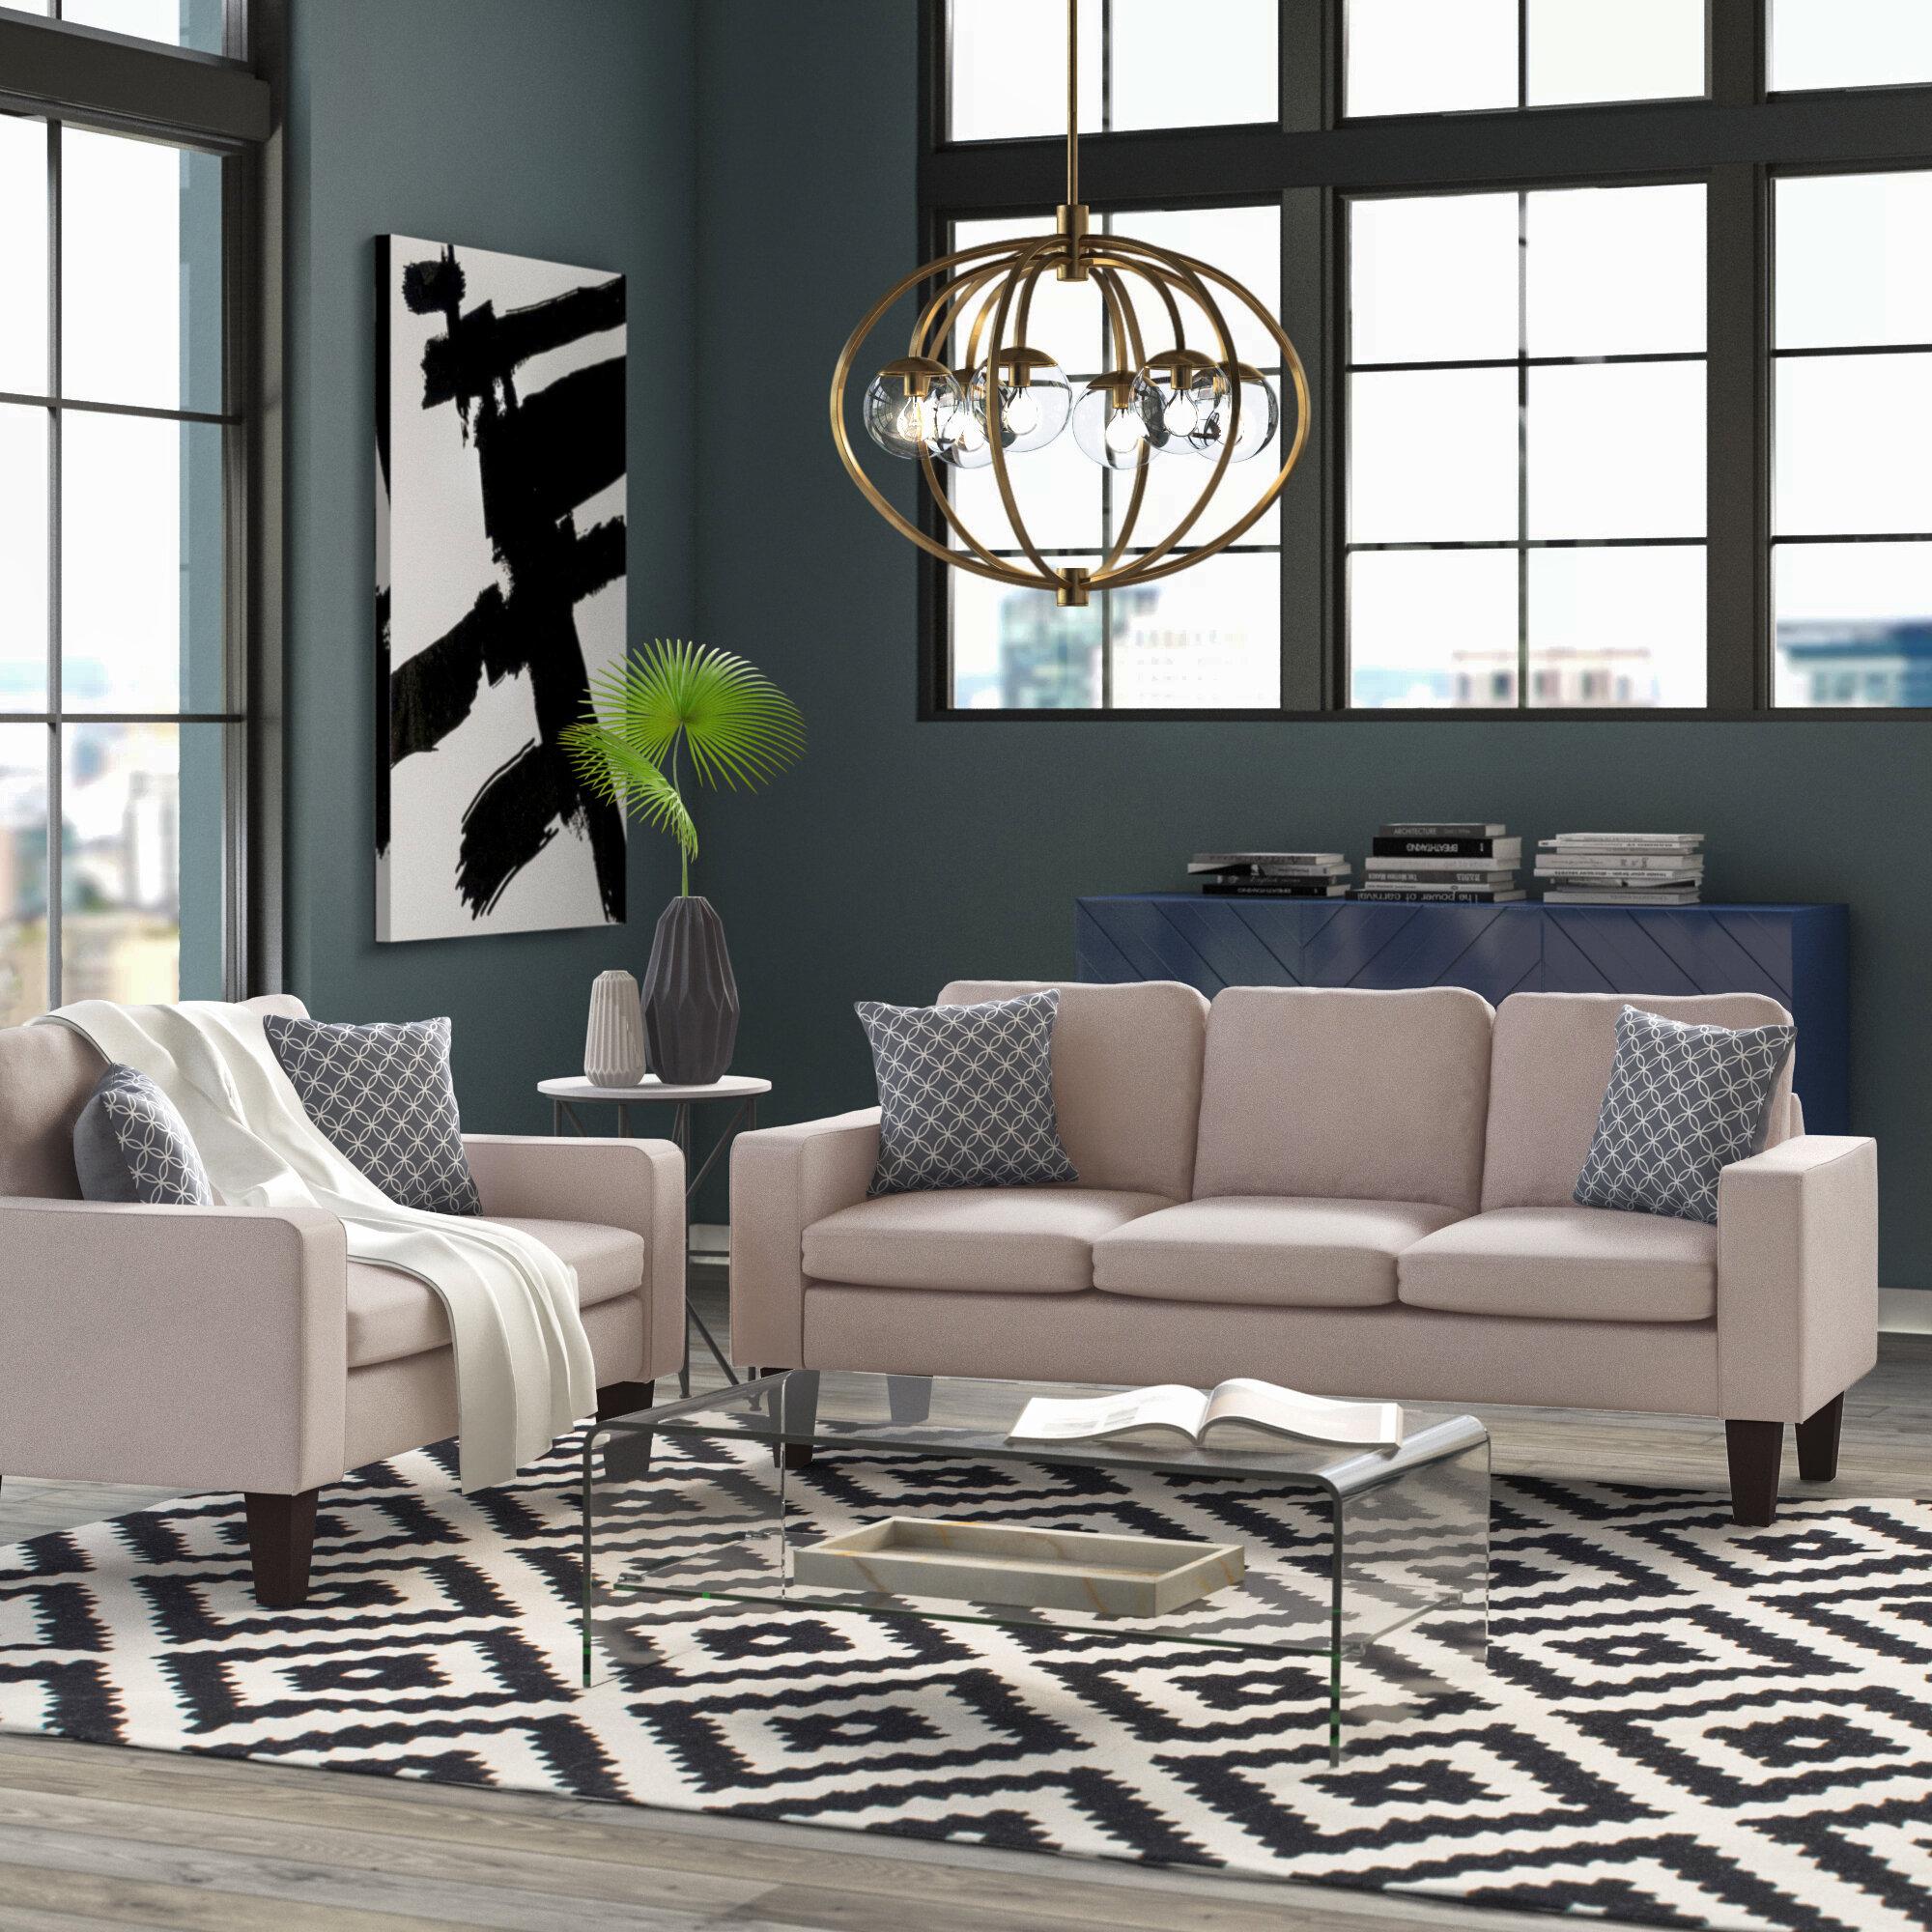 5 Piece Standard Living Room Set